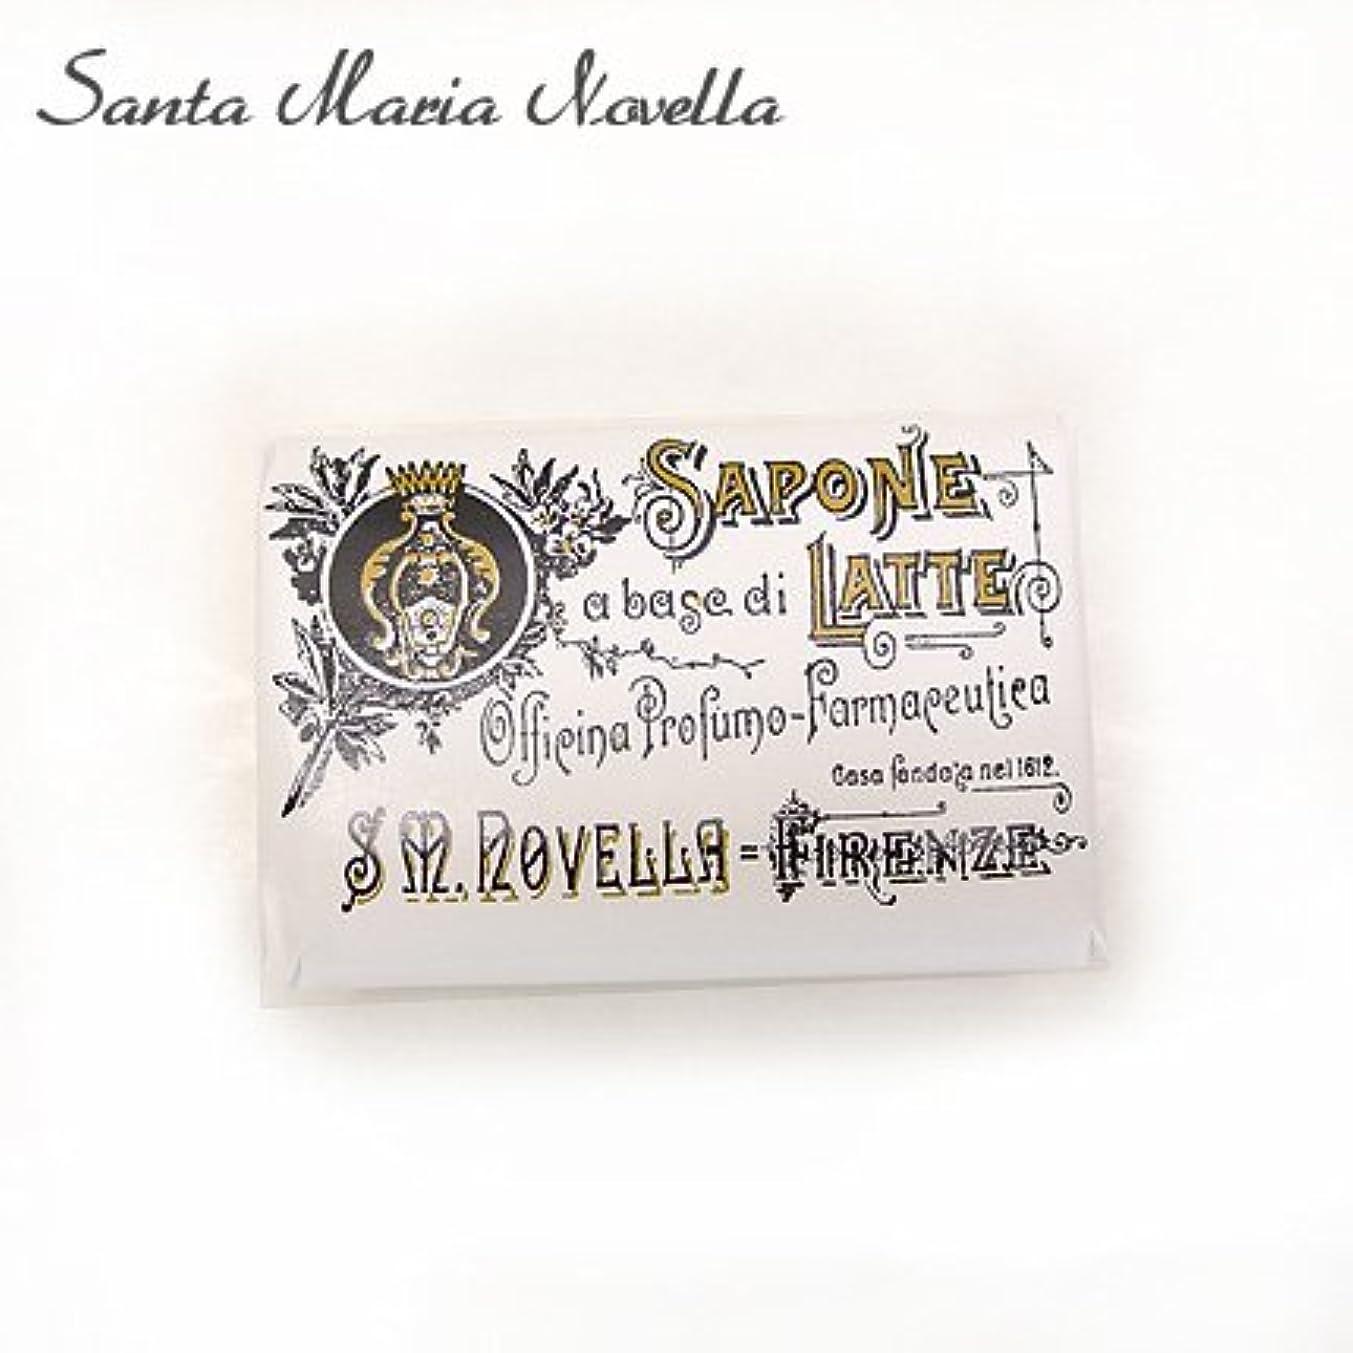 【Santa Maria Novella(サンタマリアノヴェッラ)】 石鹸 ミルクソープ カーネーション 100g (38940217) [並行輸入品]